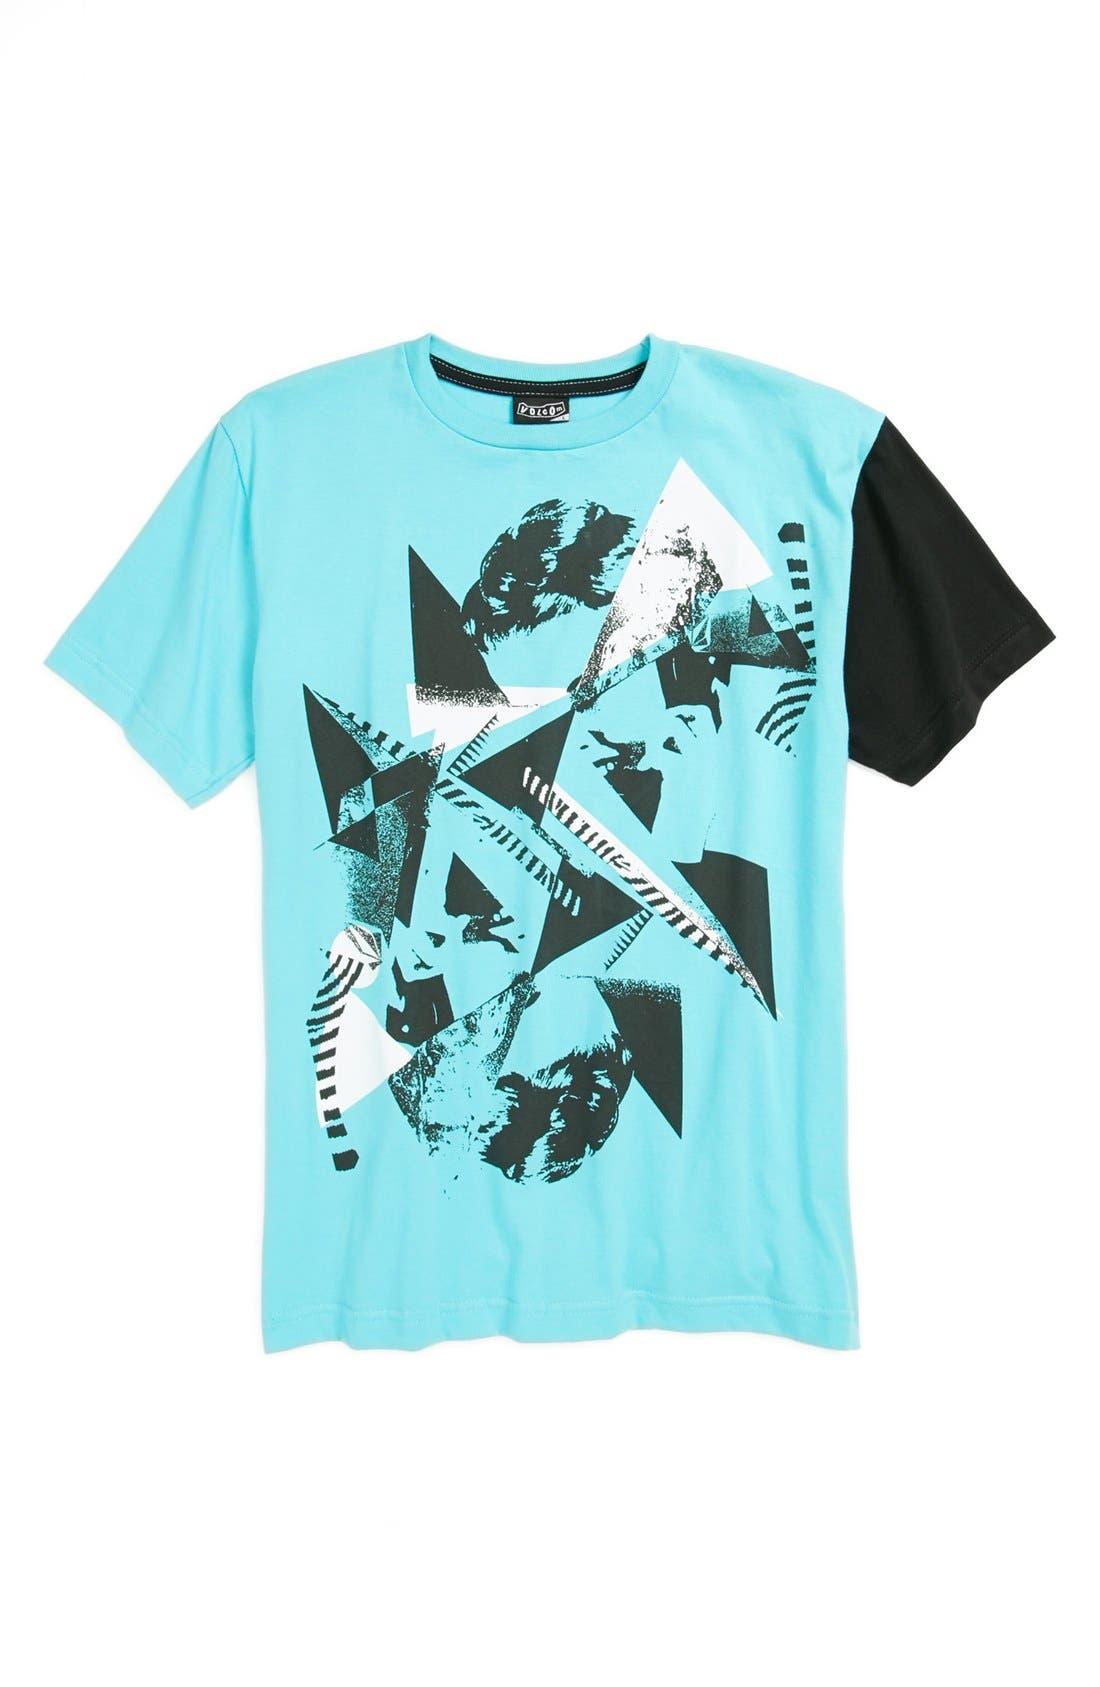 Main Image - Volcom 'Trichoto' T-Shirt (Big Boys)